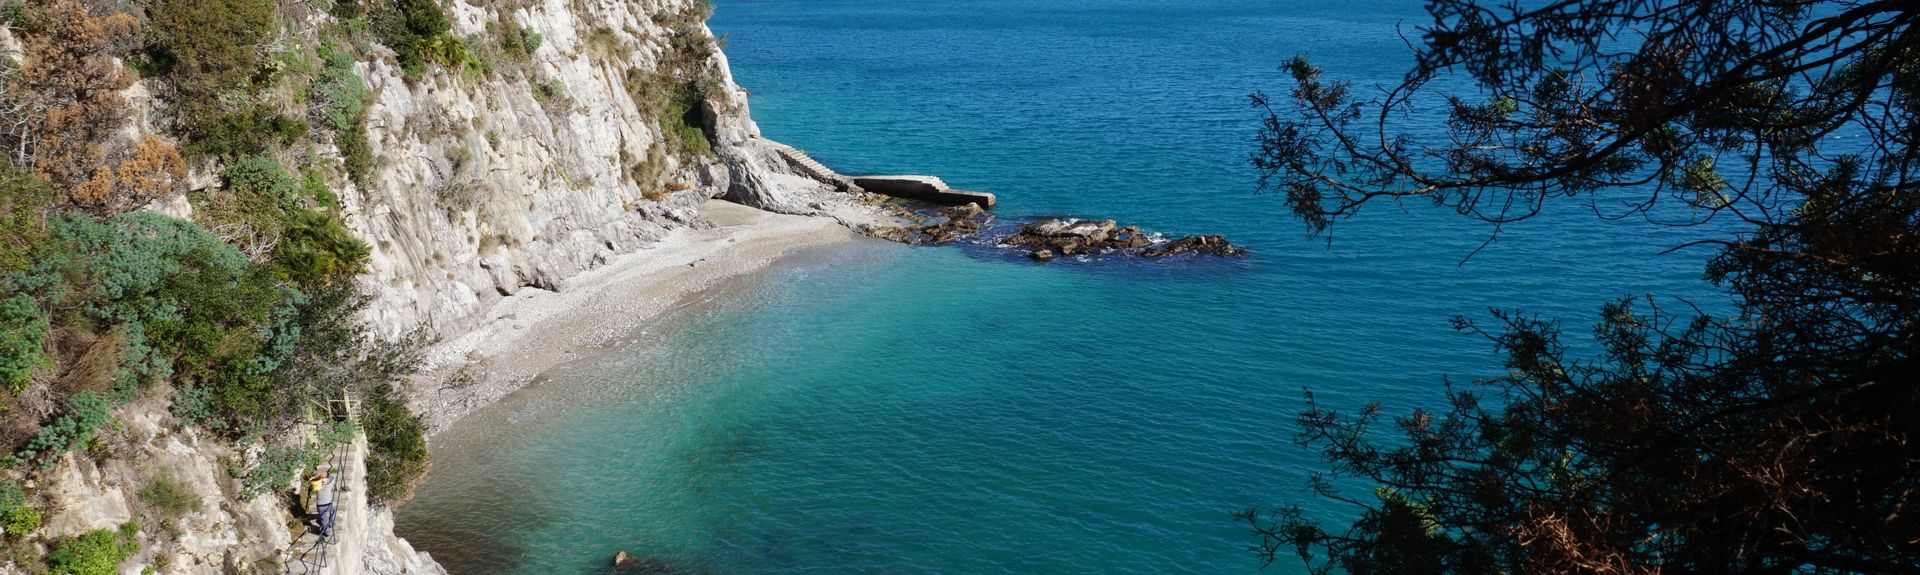 Ravello, Salerno, Campania, Italy